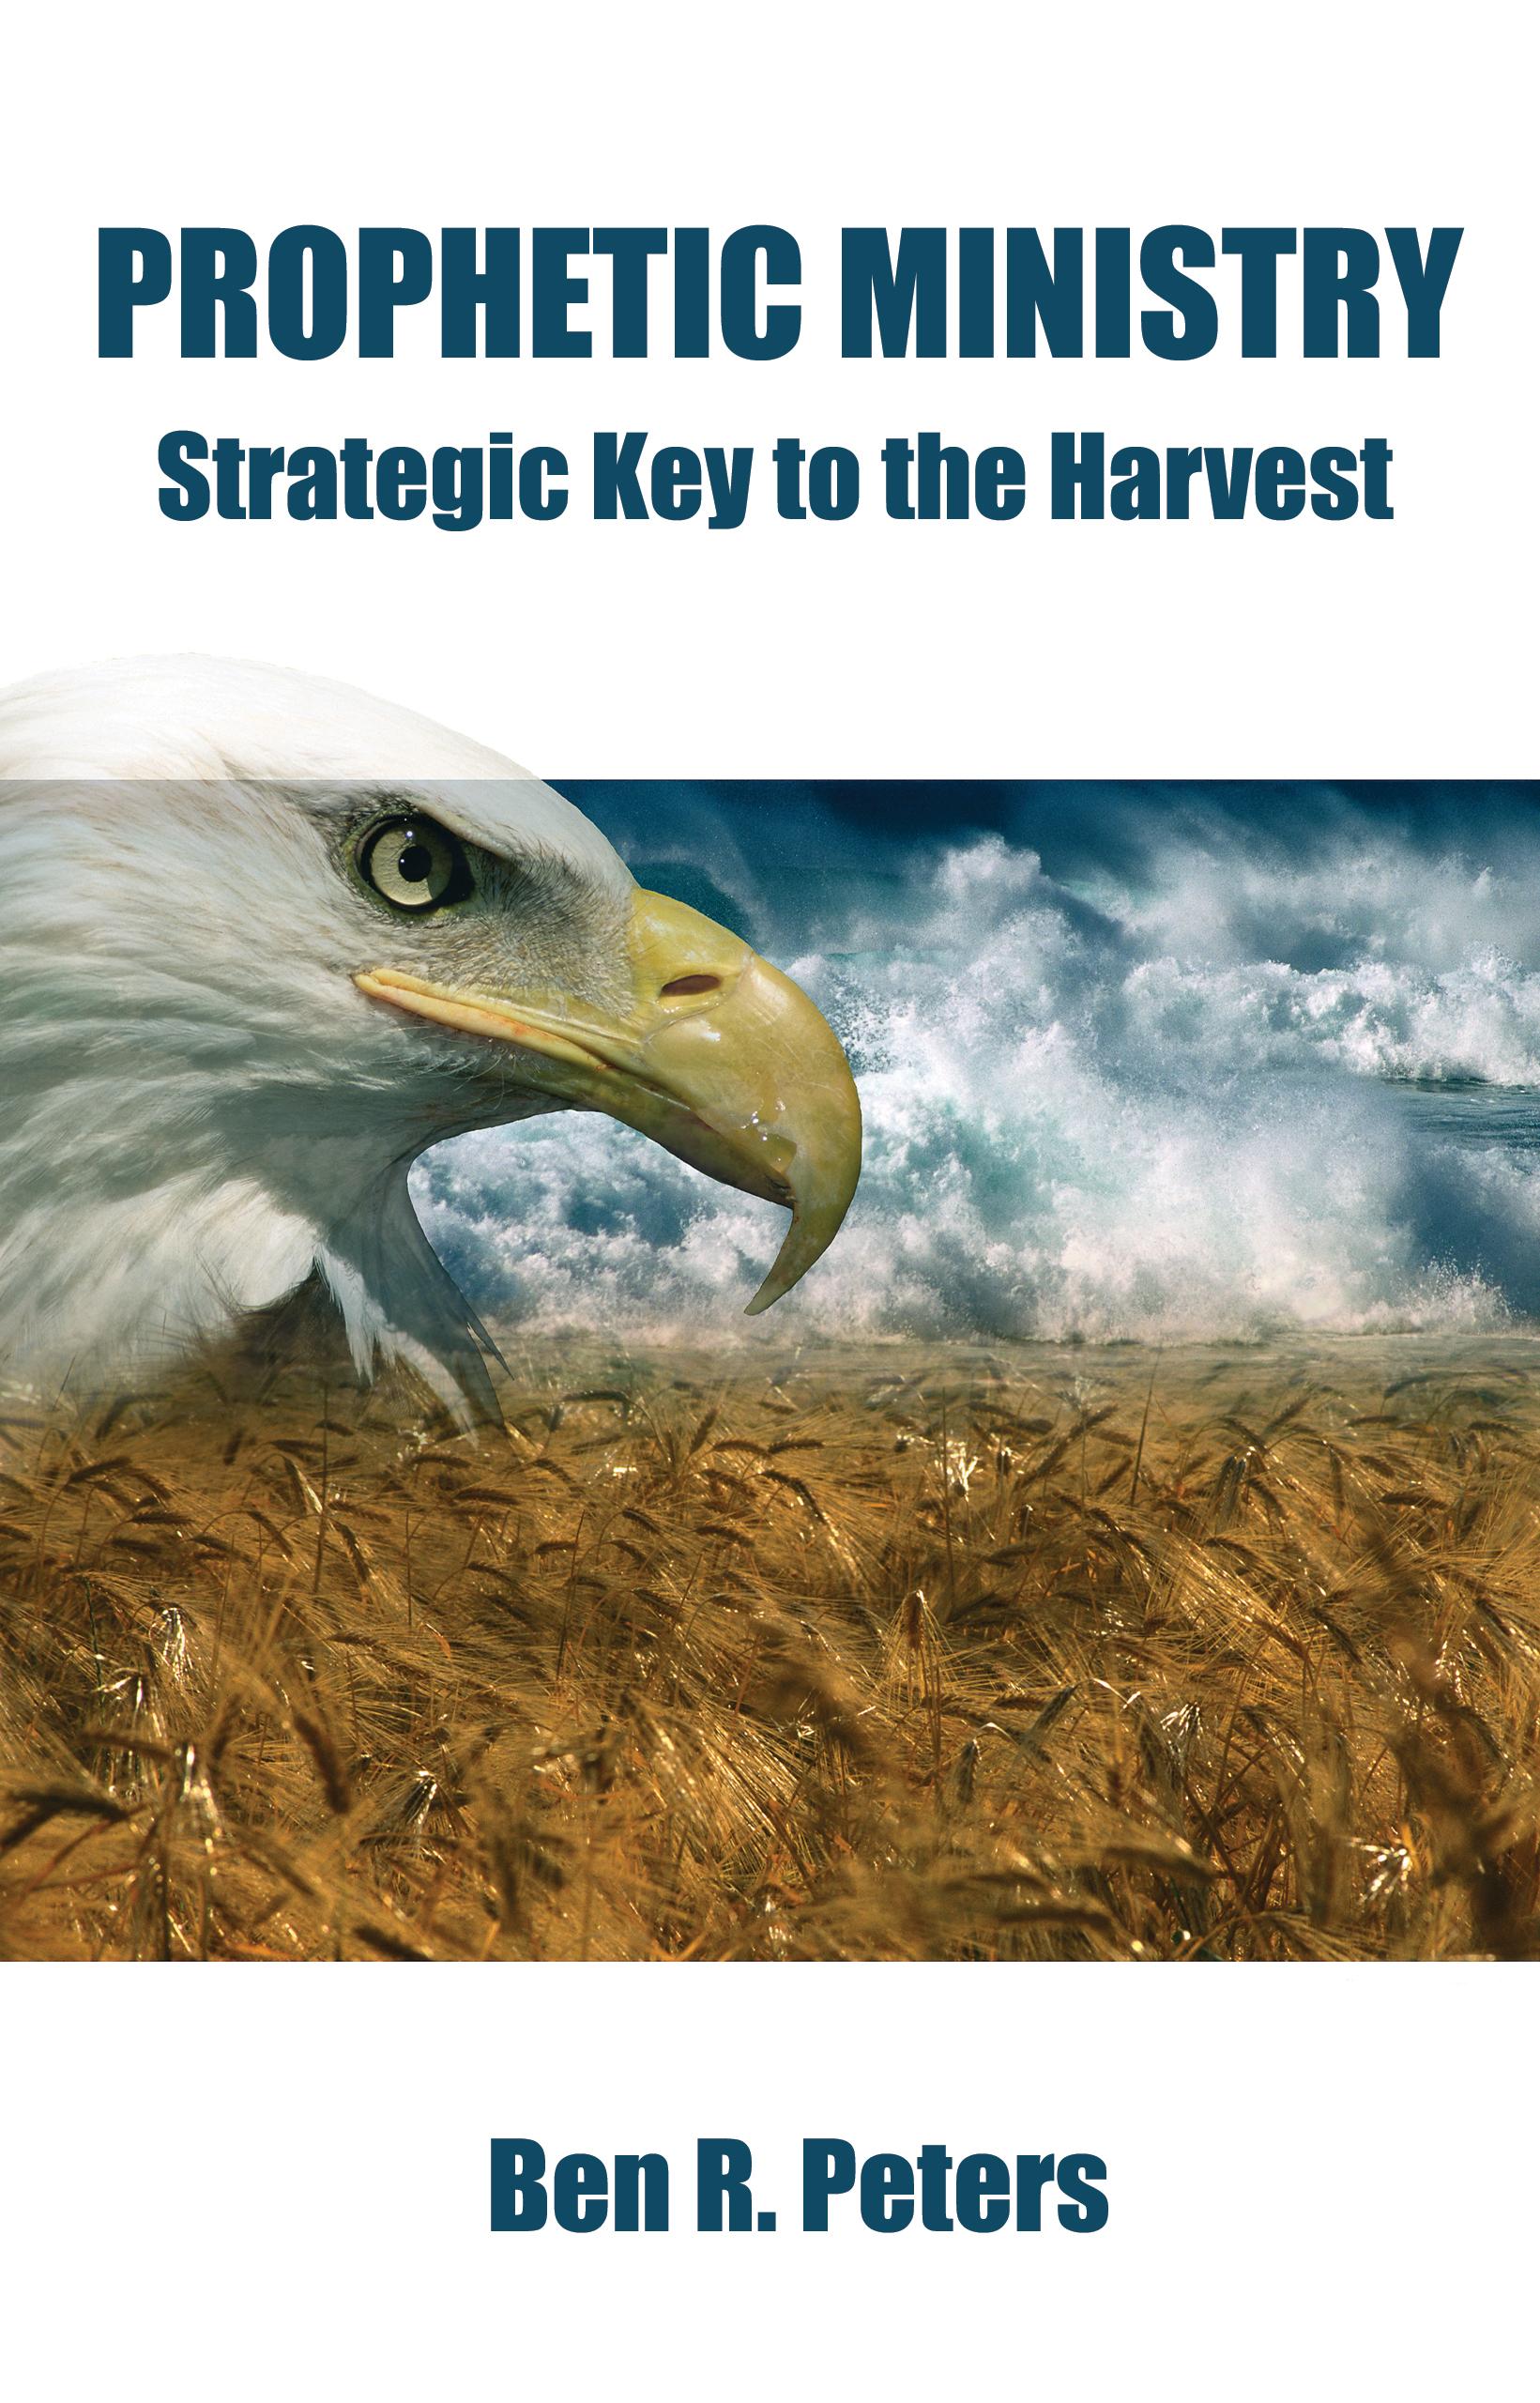 Smashwords – Prophetic Ministry: Strategic Key to the